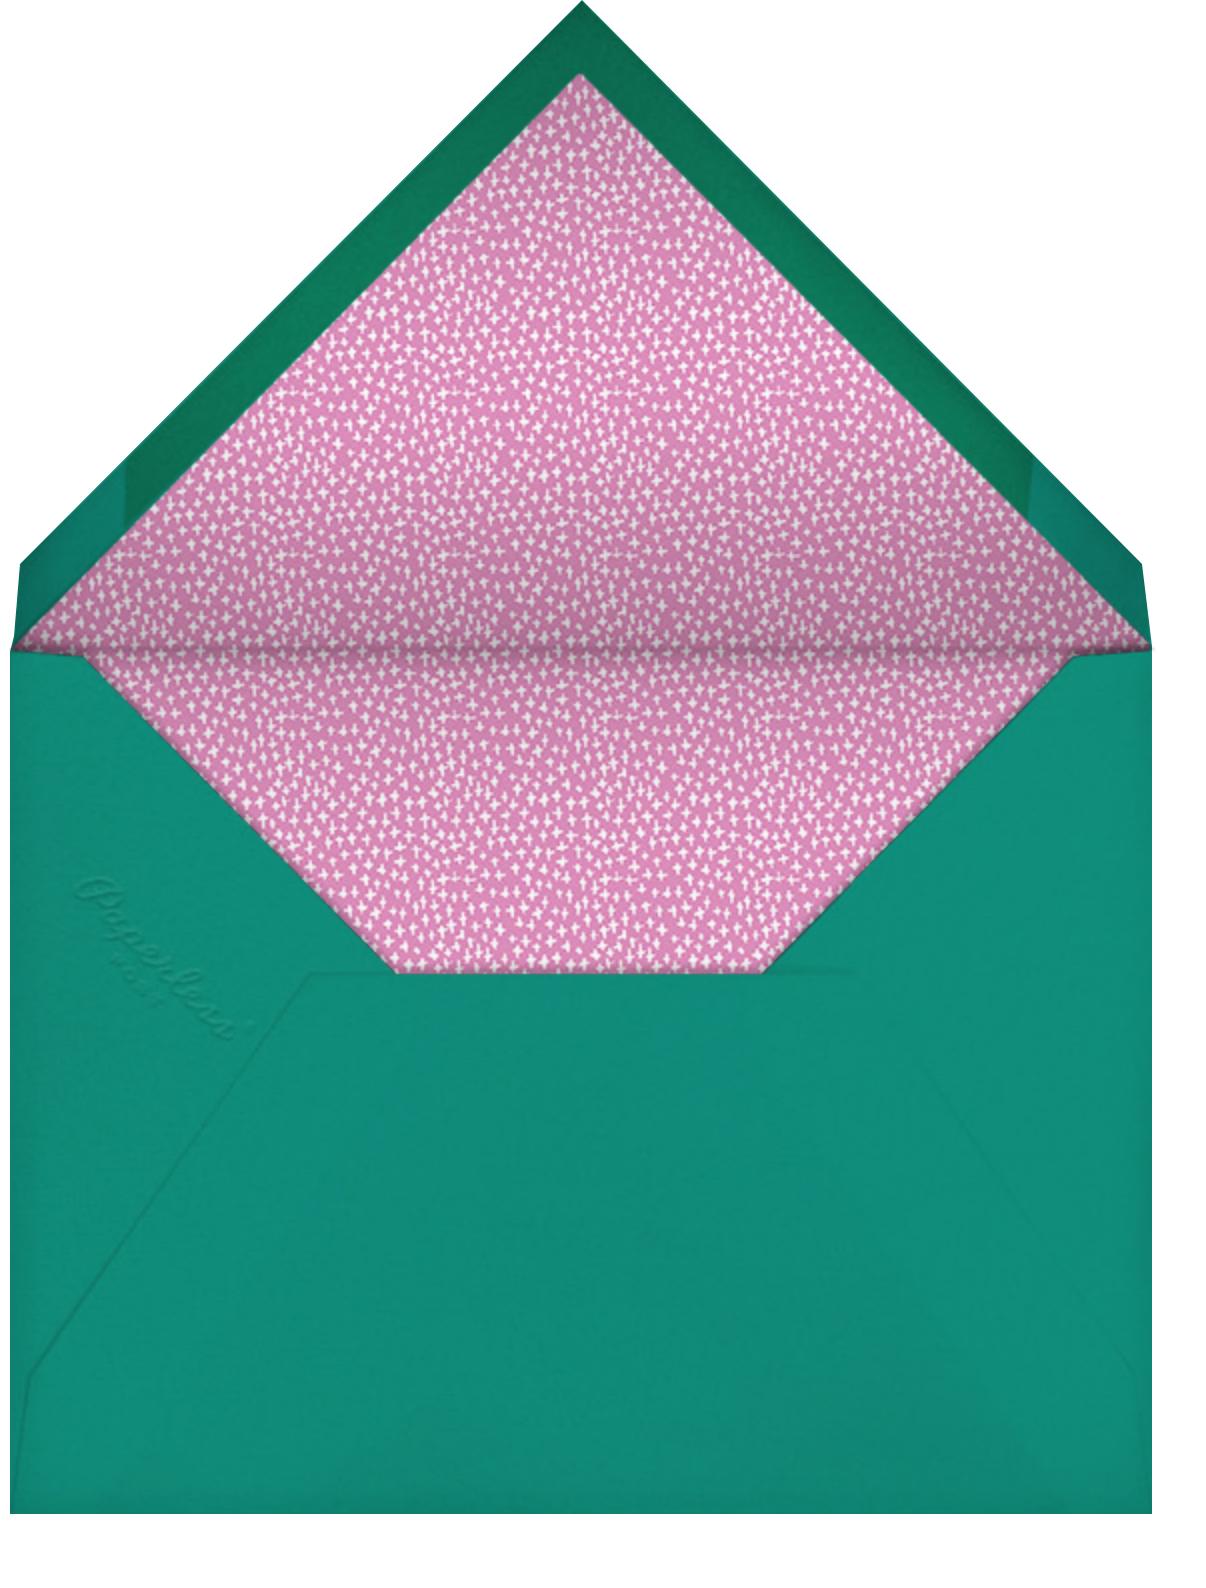 Carrier Pigeon - Mr. Boddington's Studio - Envelope